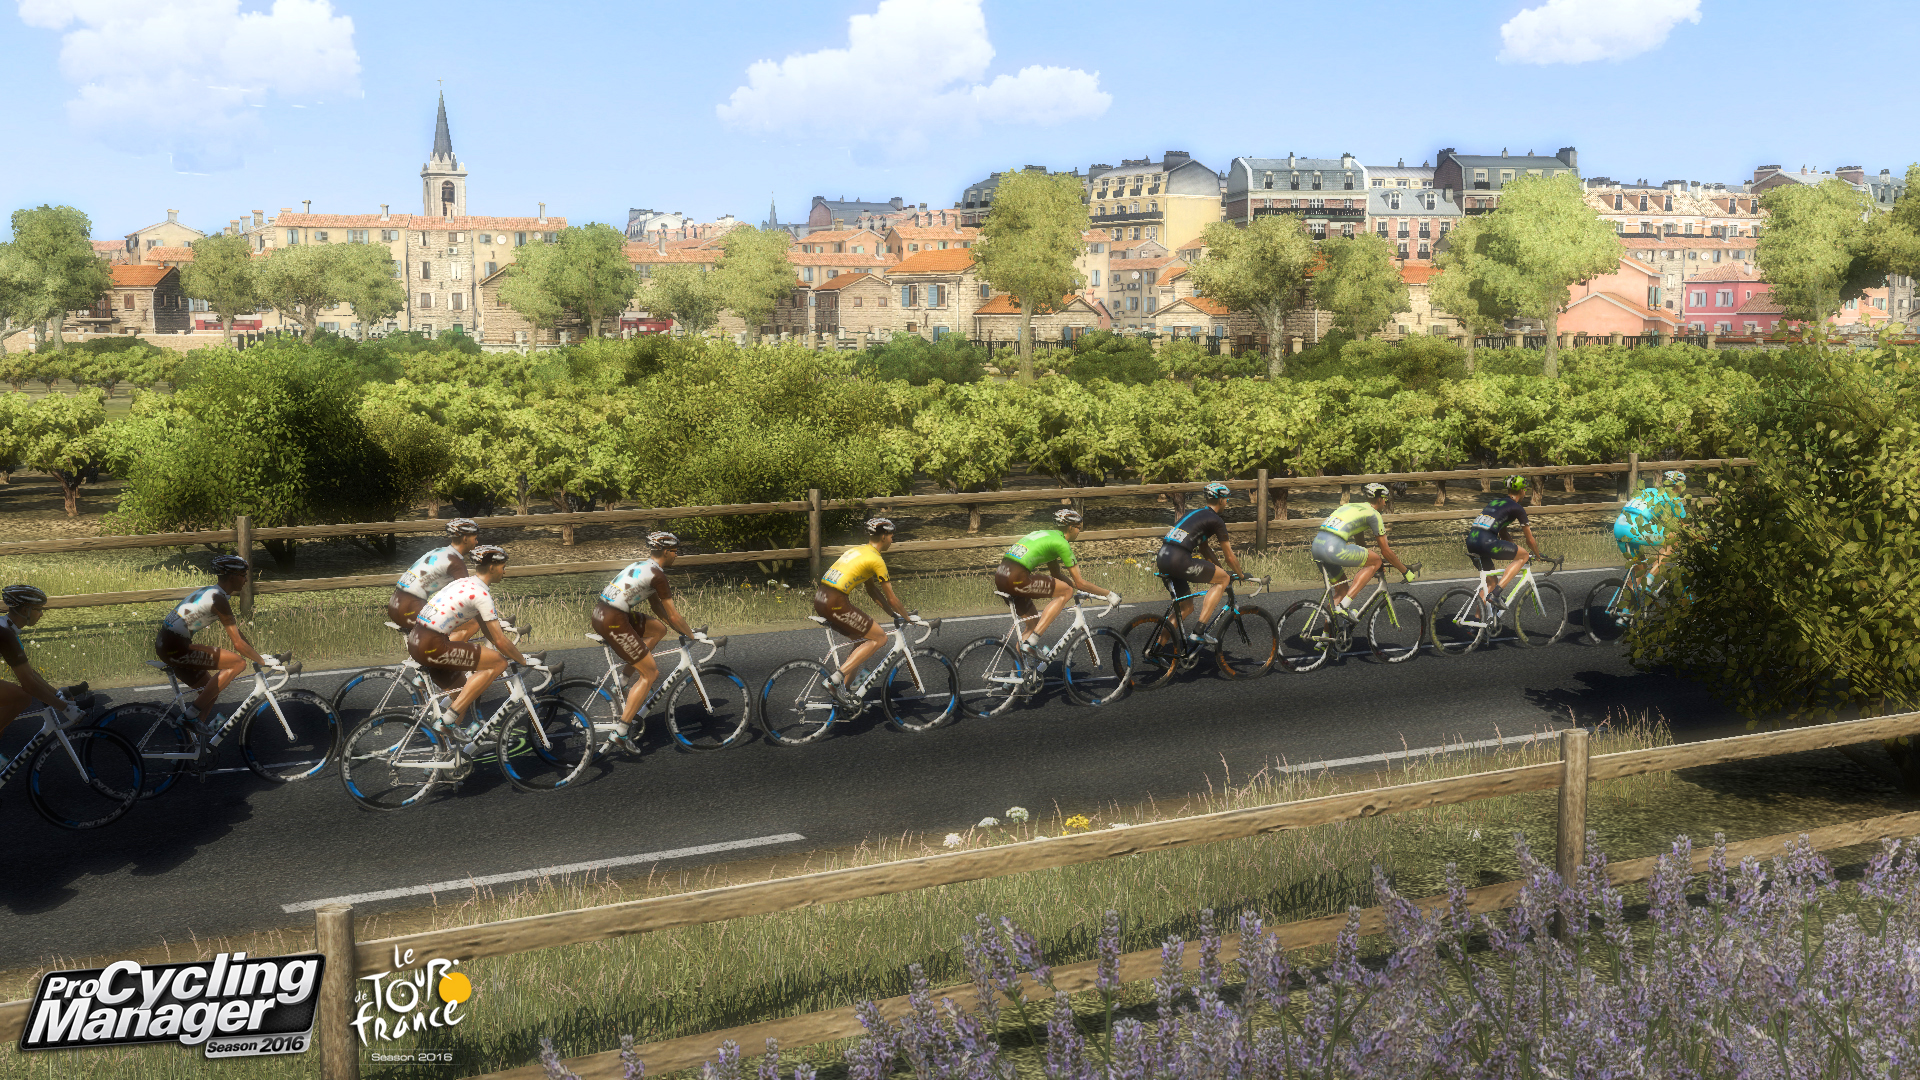 Pro Cycling Manager 2016 ESPAÑOL PC Descargar Full (SKIDROW) + REPACK 1 DVD5 (JPW) 4